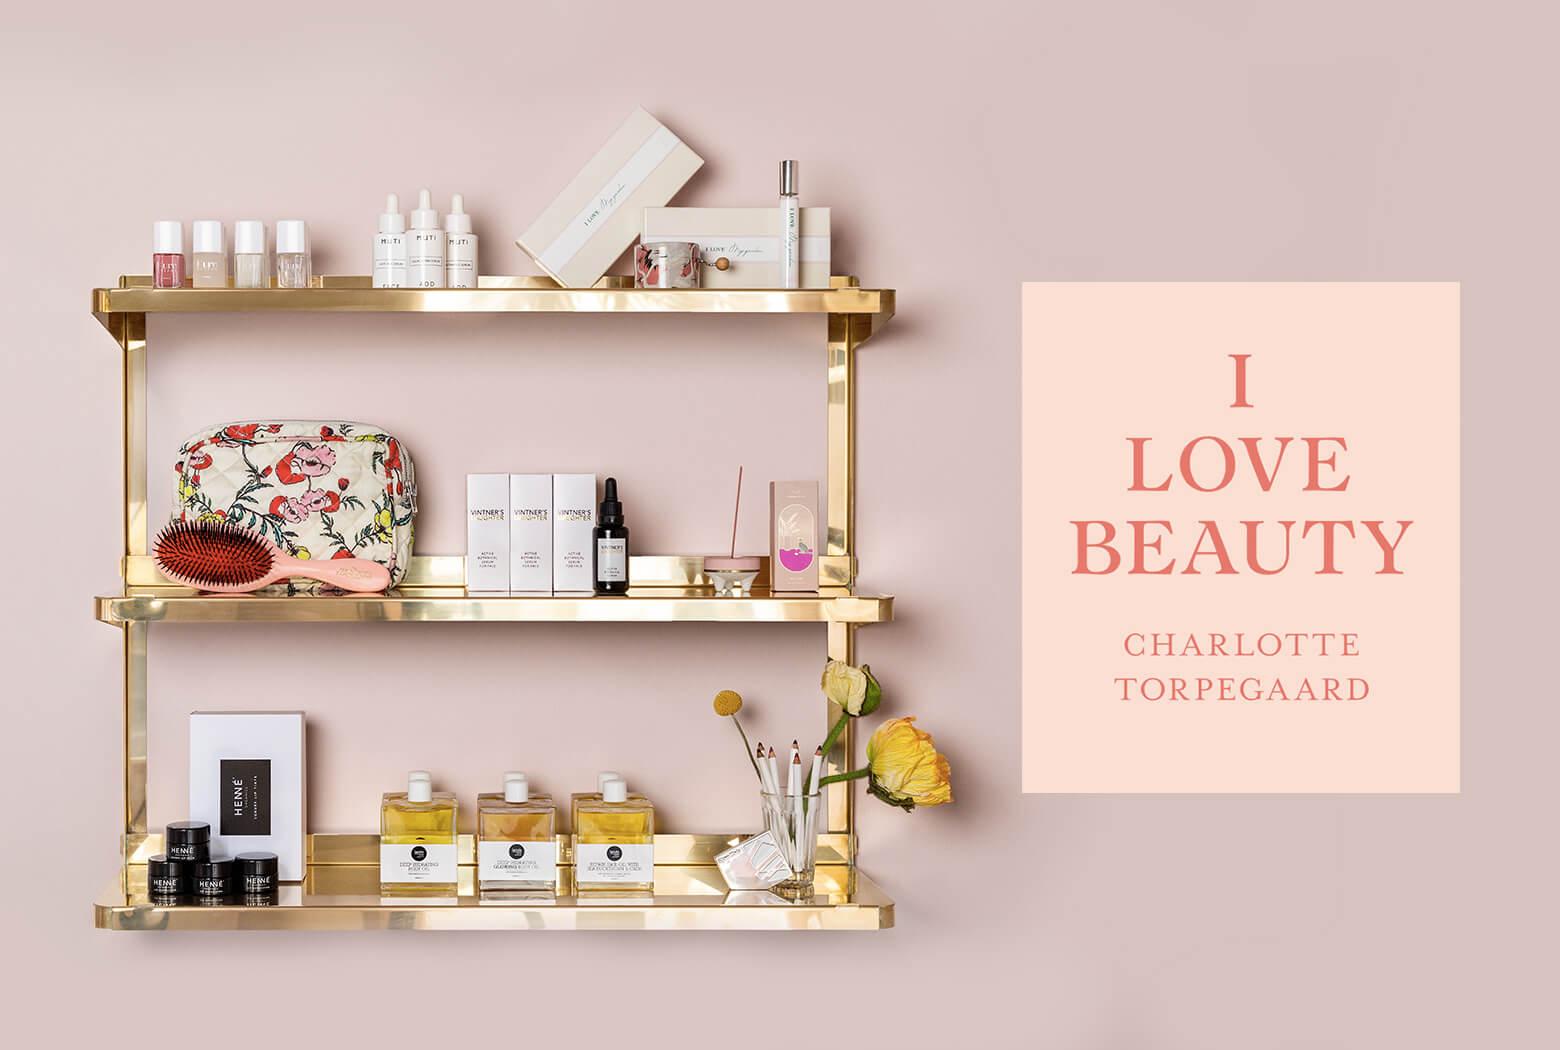 187 Sharin Foo I Love Beauty Charlotte Torpegaard